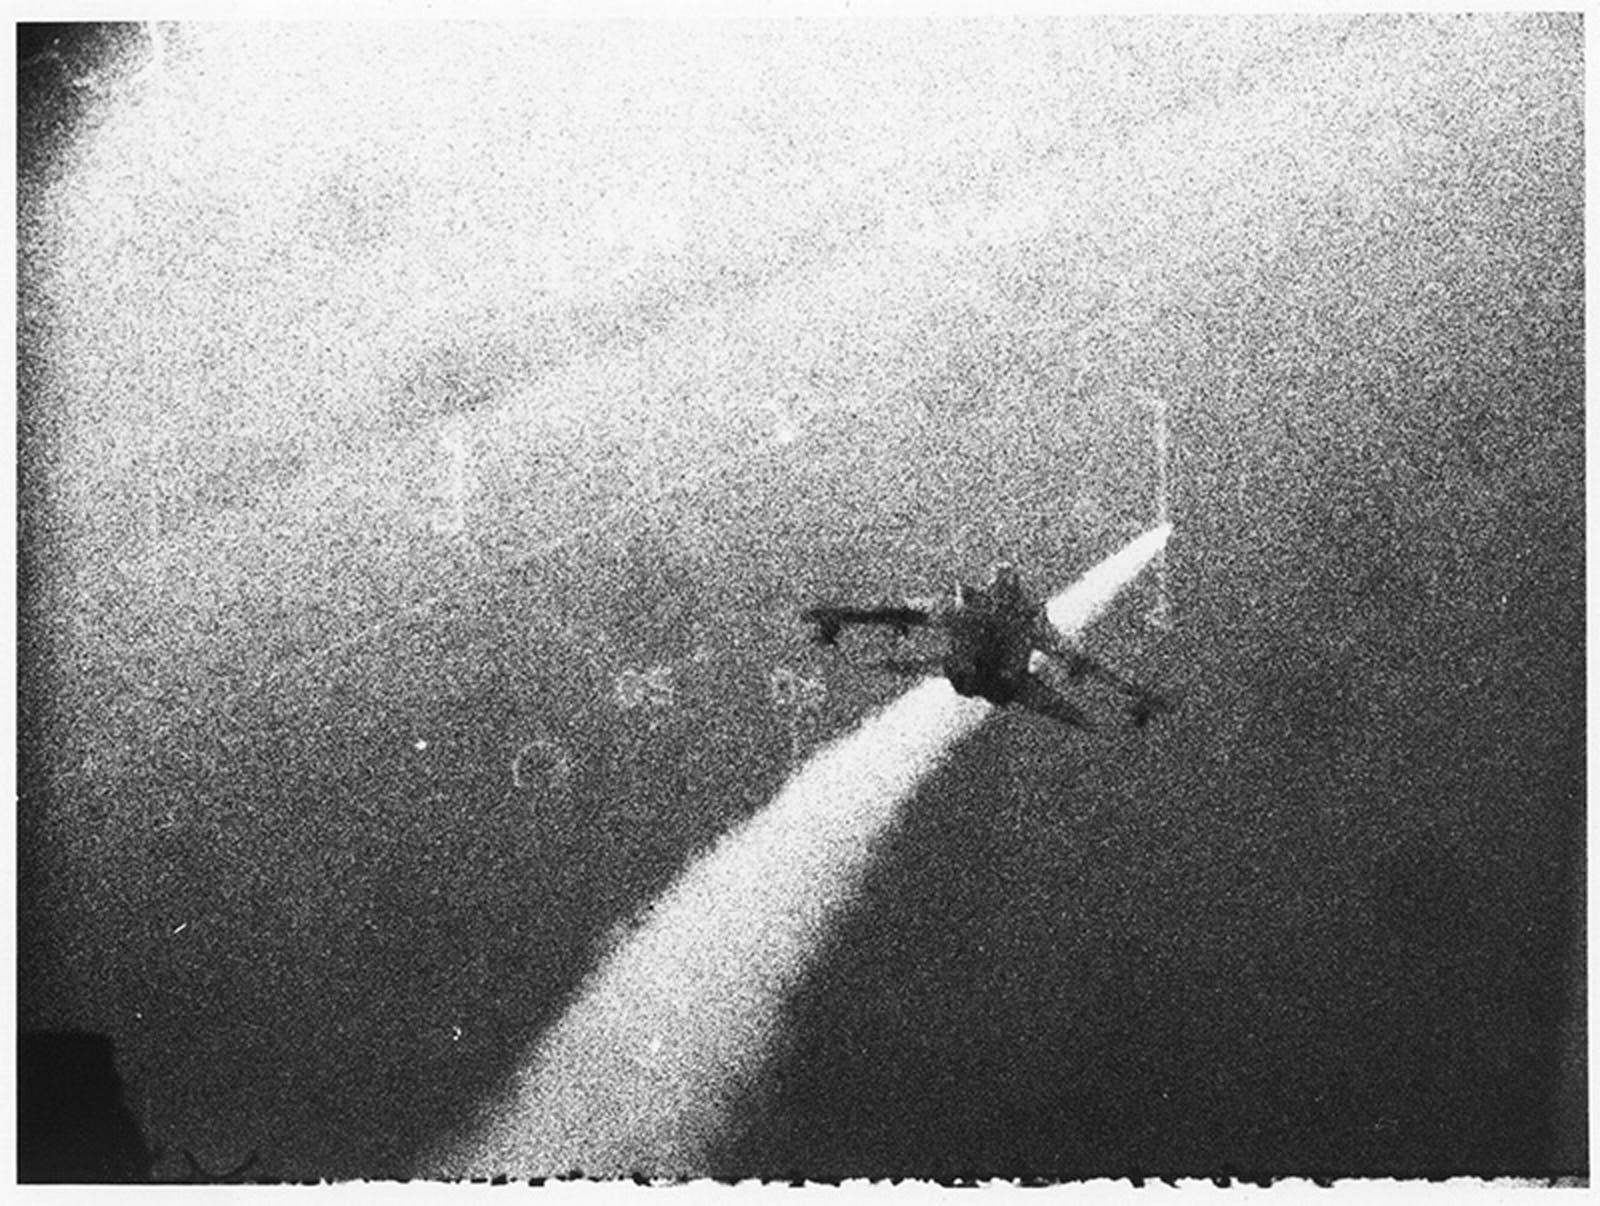 Sidewinder missile firing from Tornado